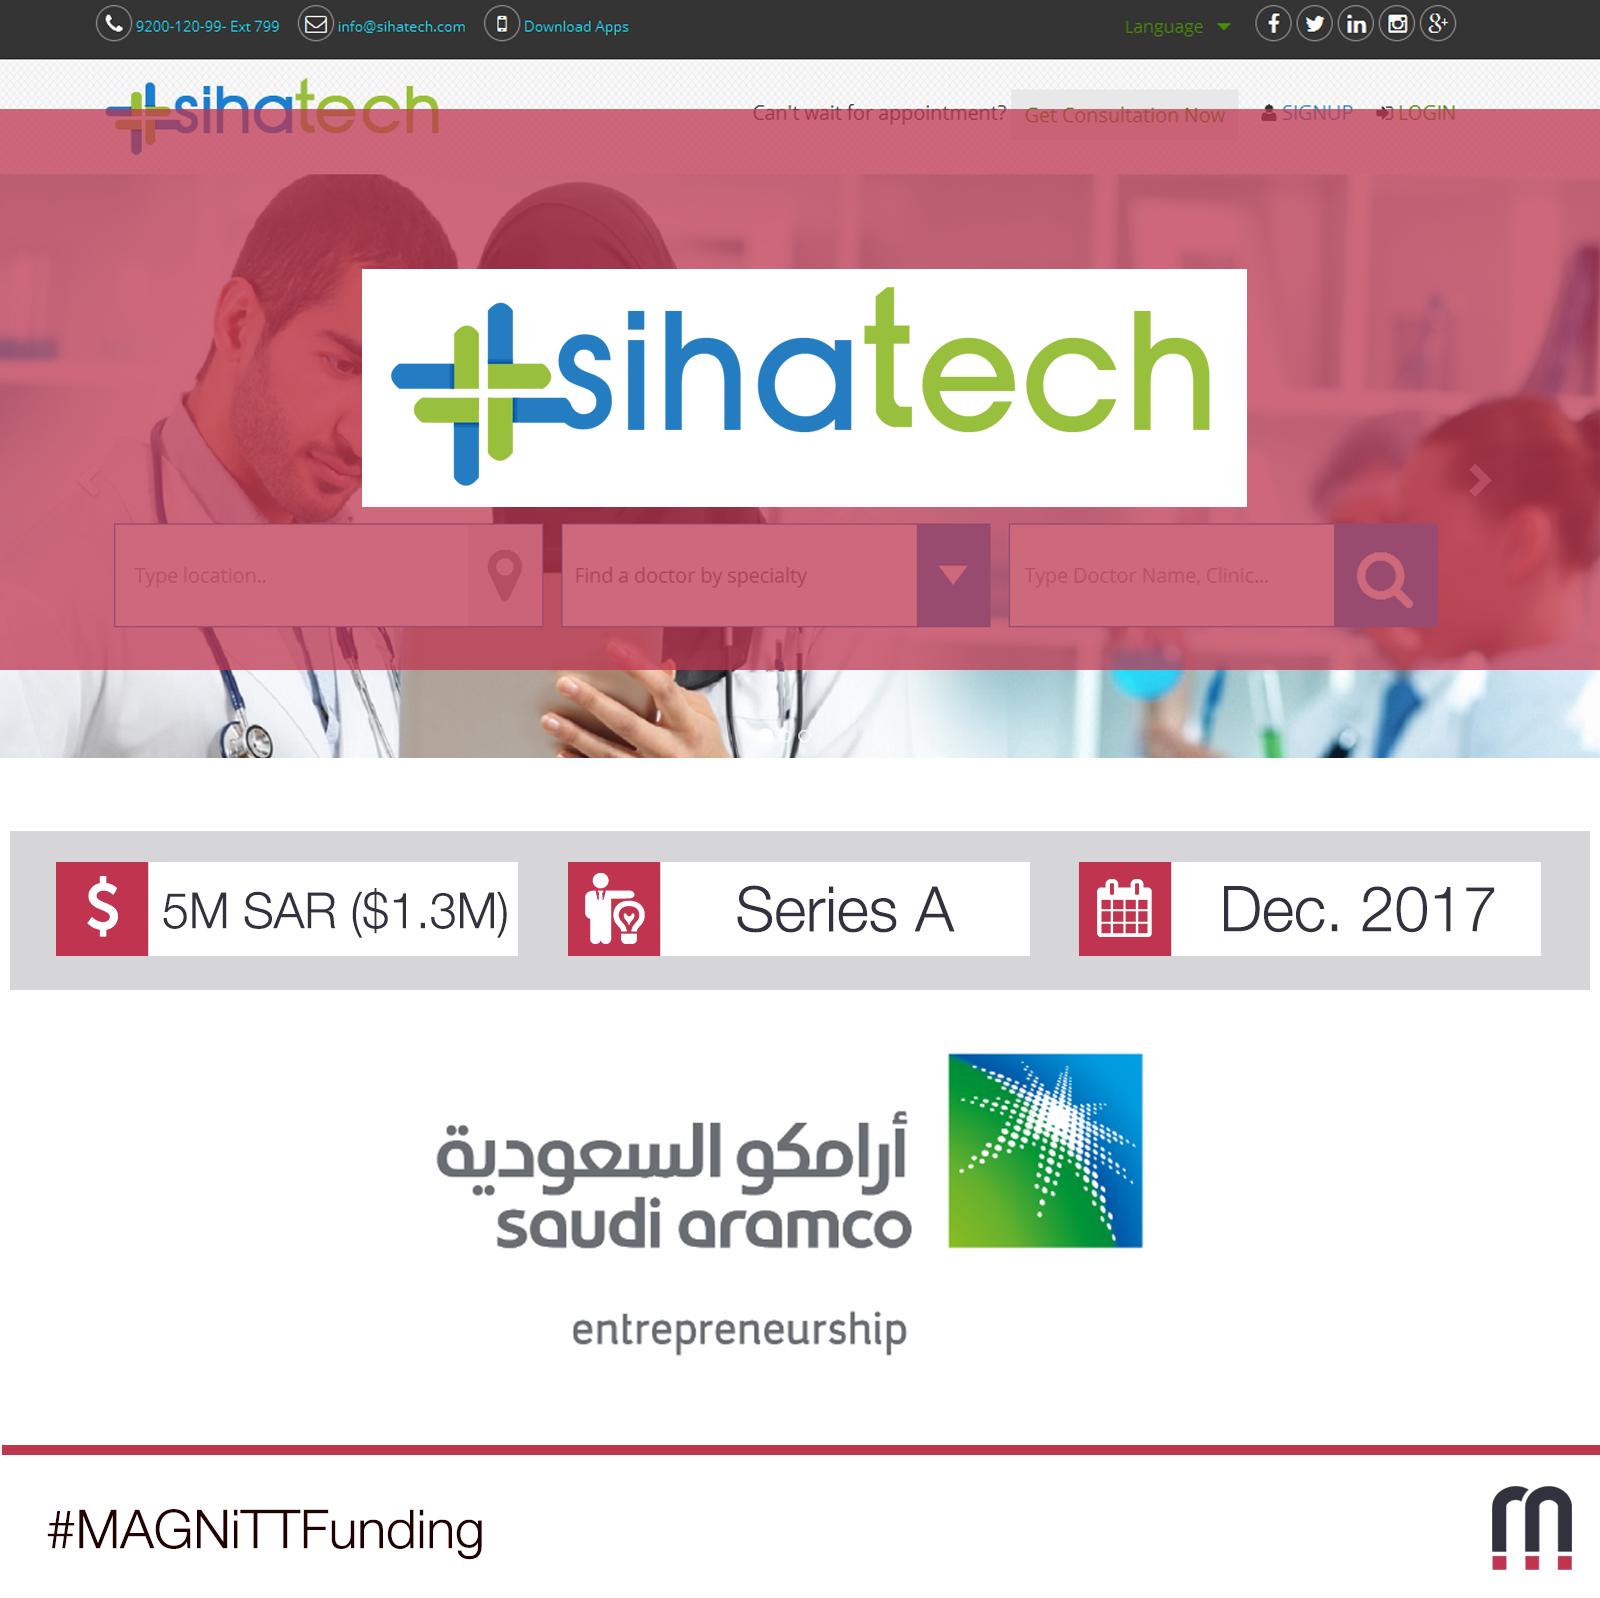 Saudi-Based Sihatech Raises $1.3m Series A Round